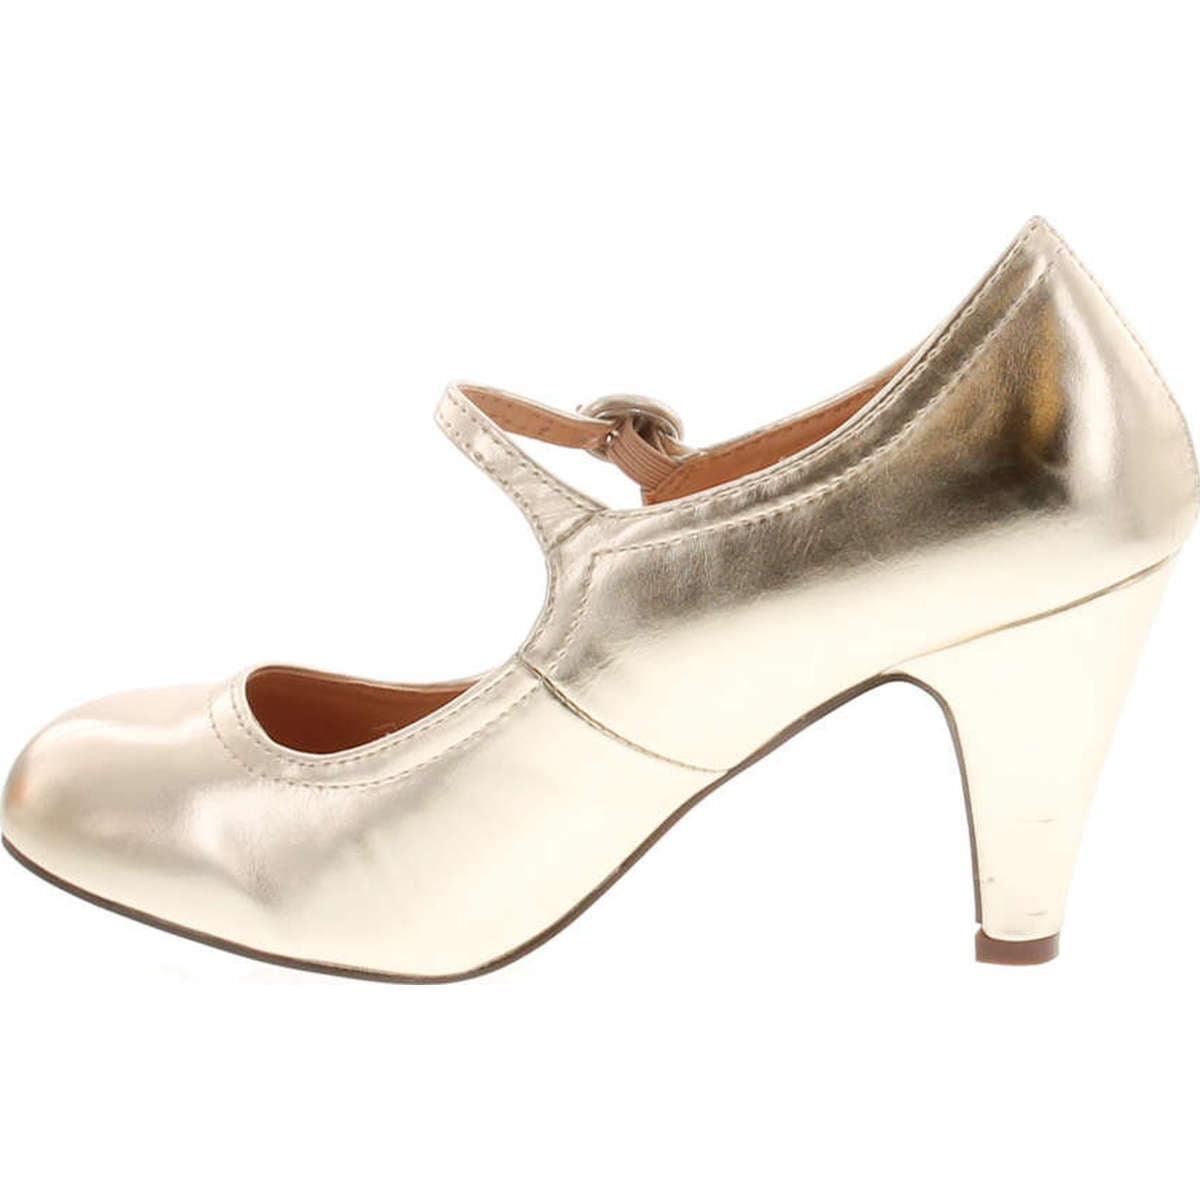 7b95360c3c92a Static Footwear - Static Footwear Kimmy-21 Women's Round Toe Pierced Mid  Heel Mary Jane Style Dress Pumps - Walmart.com